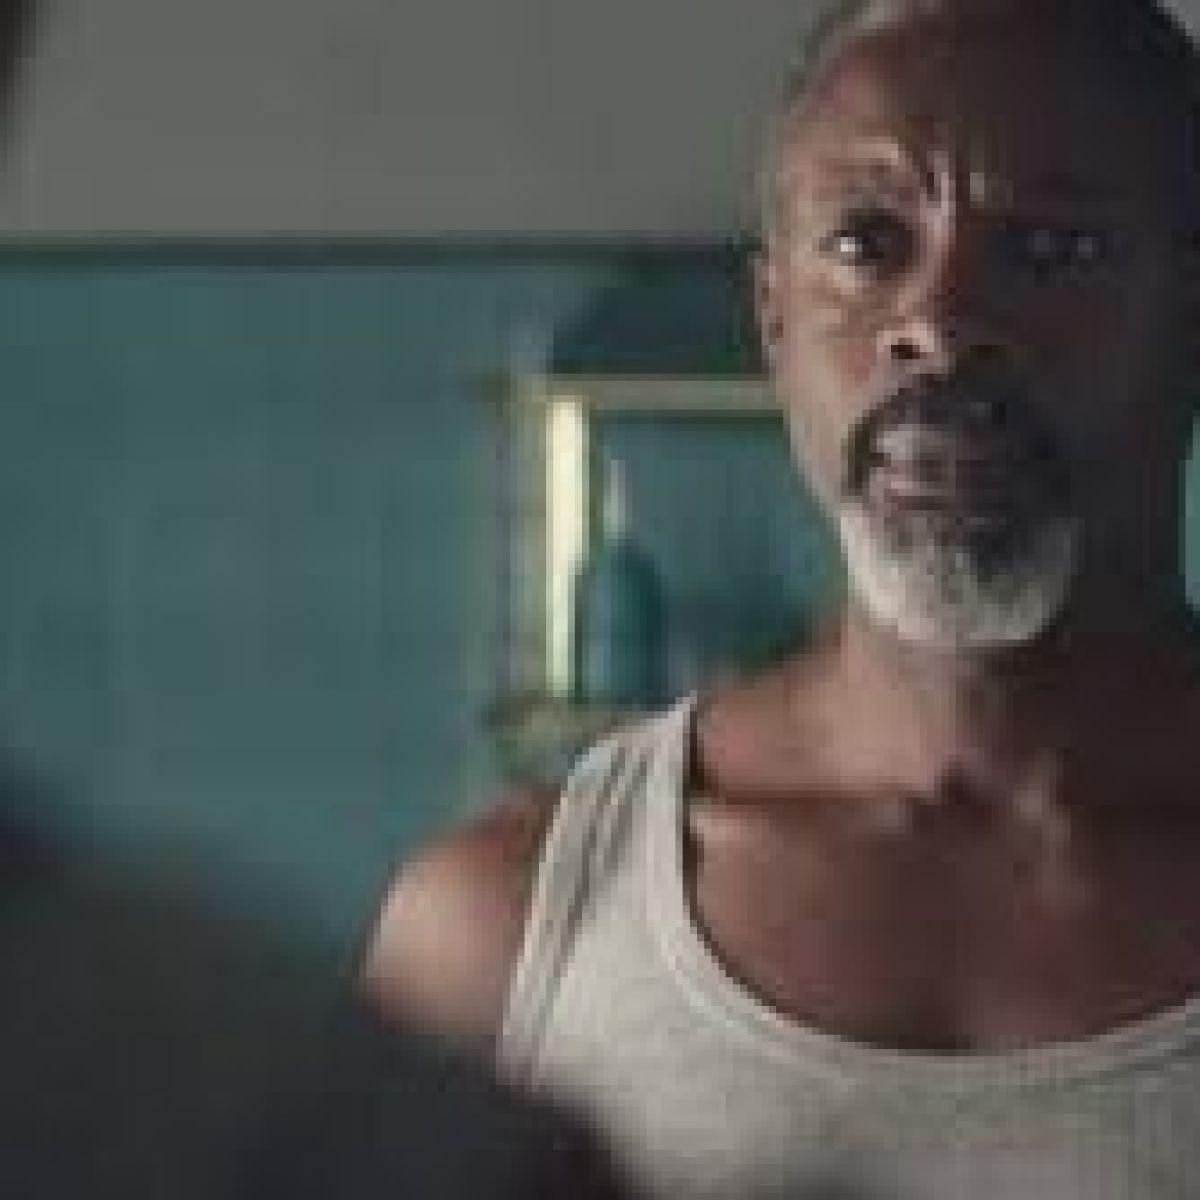 Kathy Sheridan: Gillette's toxic masculinity ad cuts close